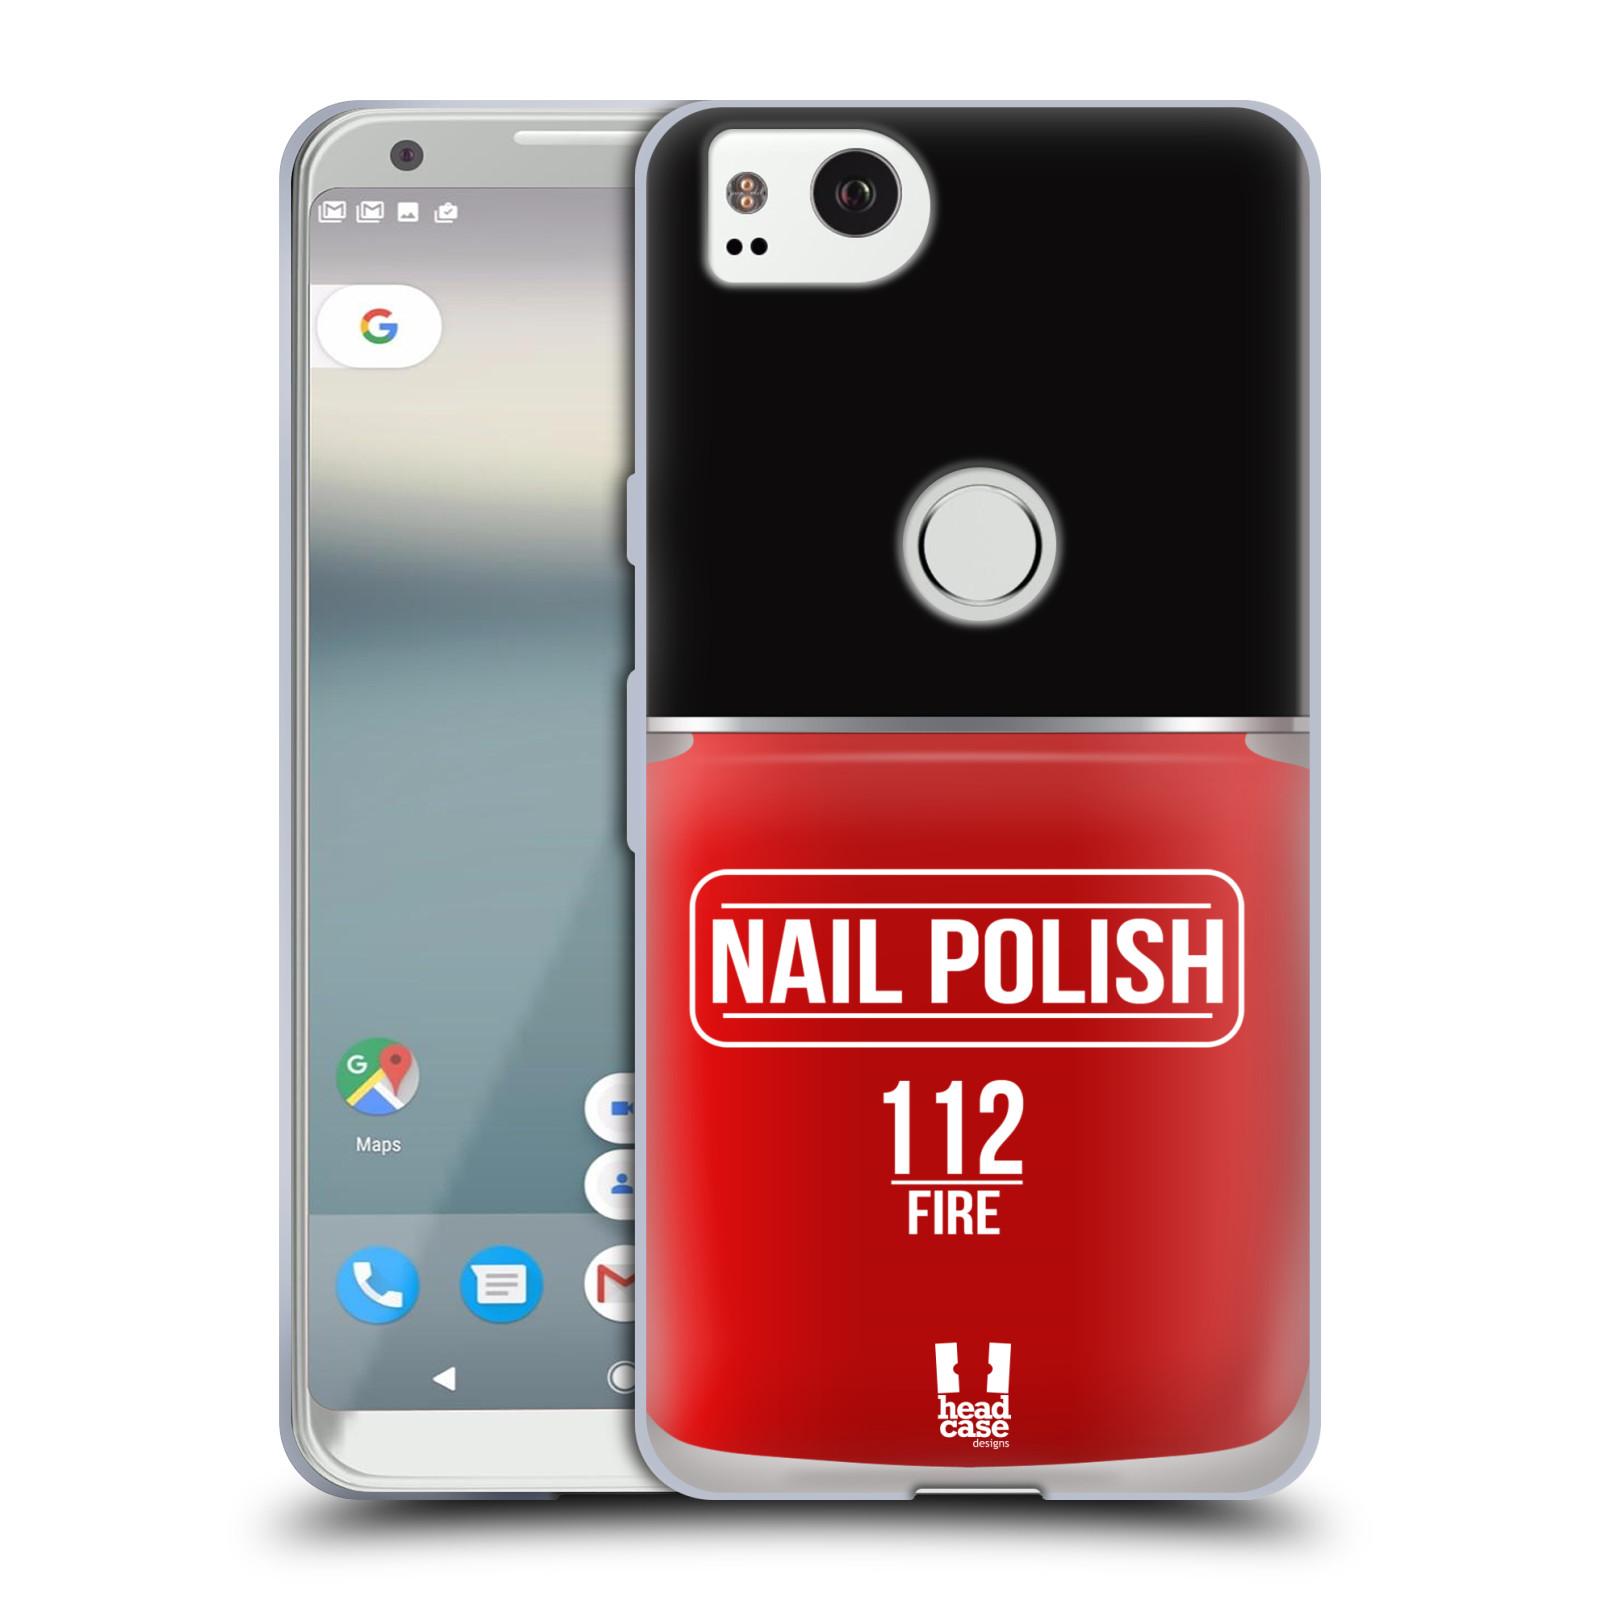 Head Case Designs Nail Polish Soft Gel Case For Amazon M4tel Phones